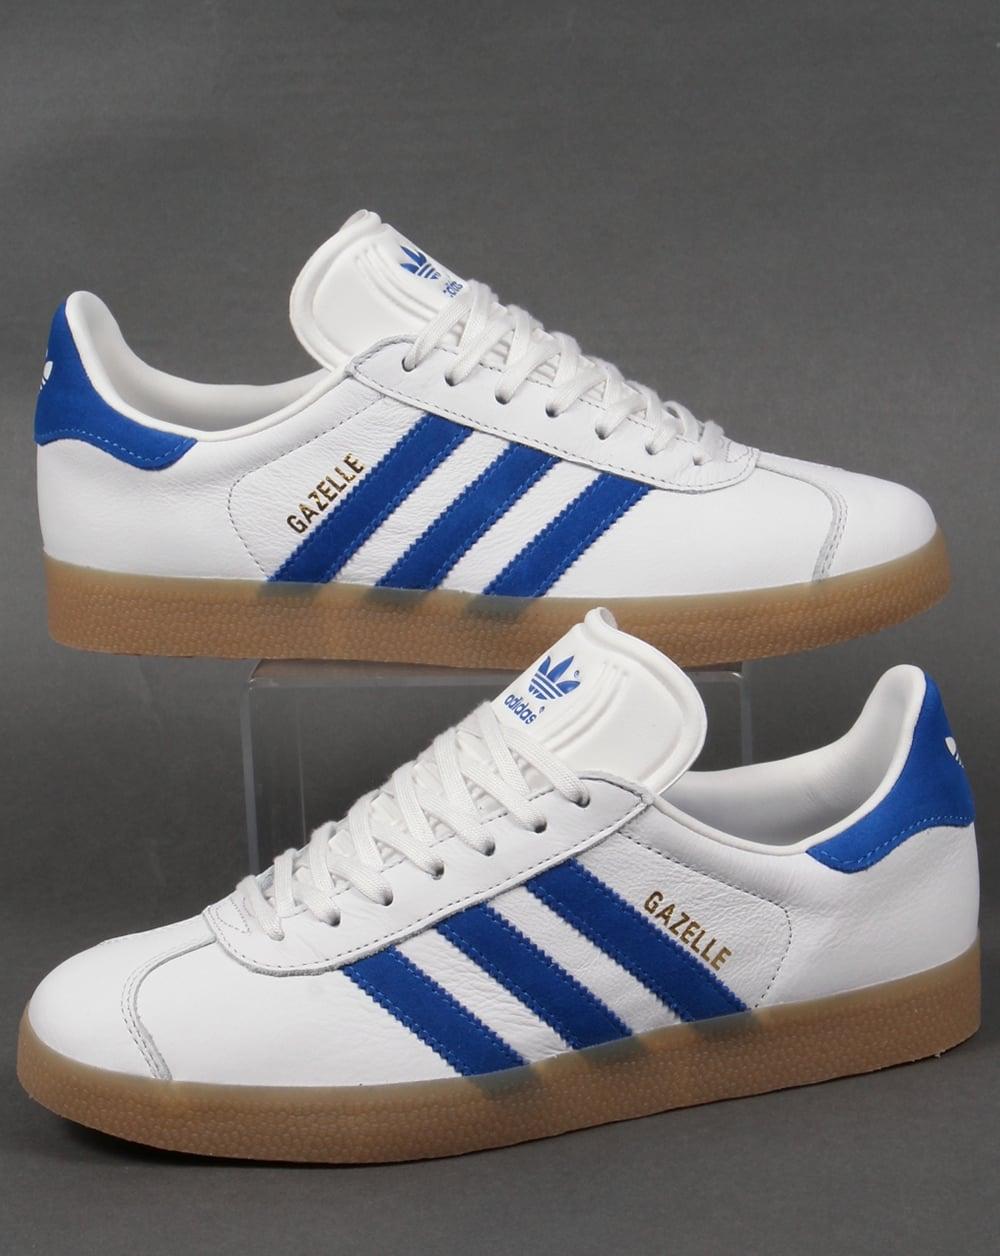 Adidas Gazelle Leather Trainer, white